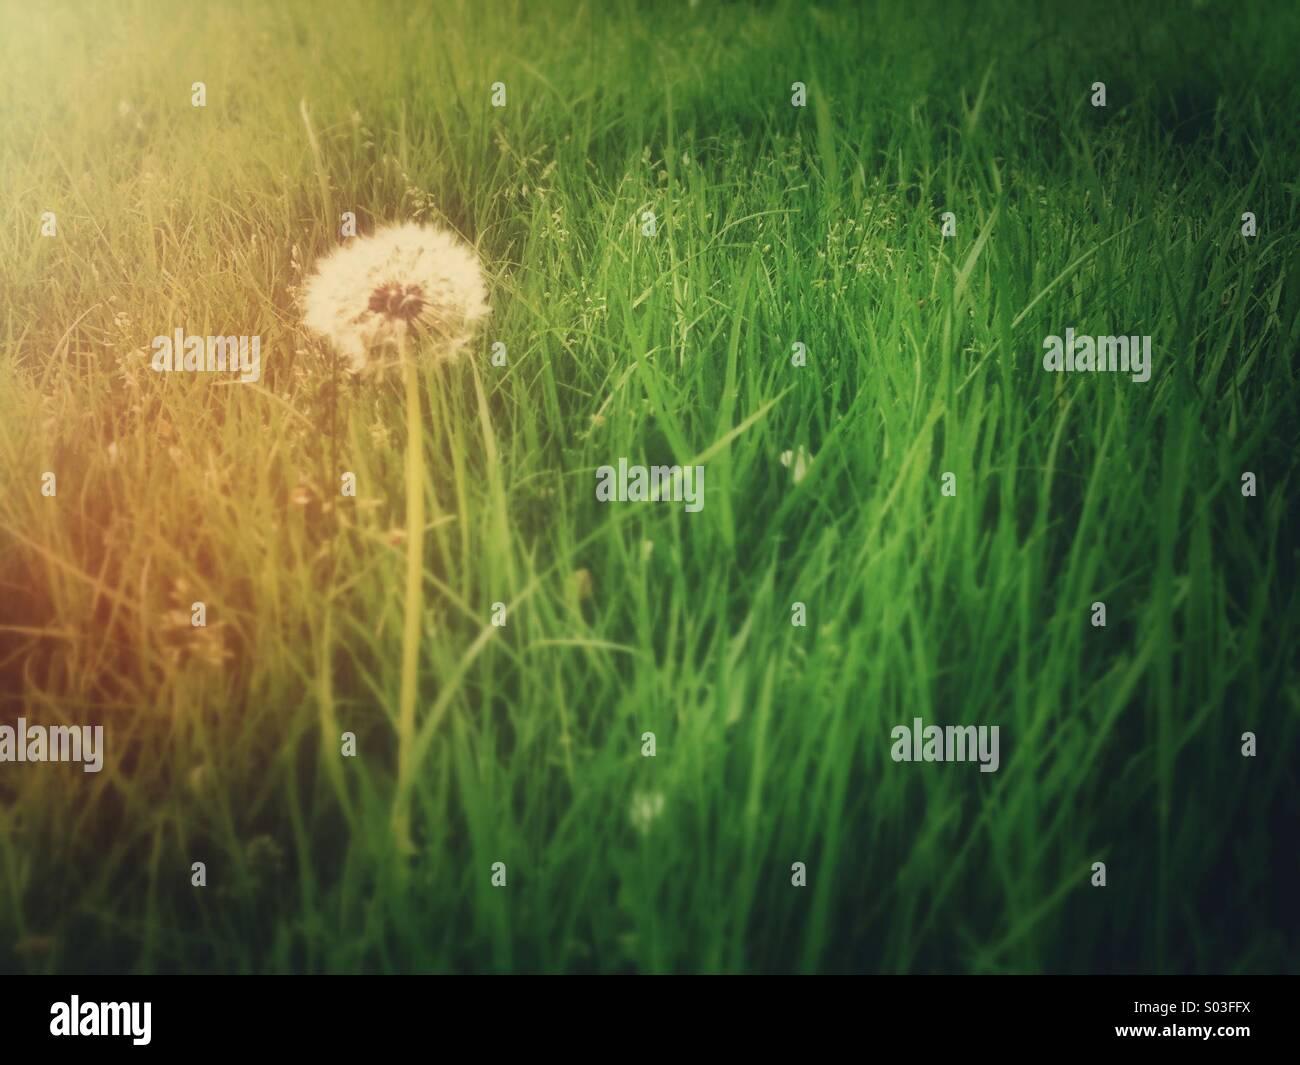 Dandelion with retro effect - Stock Image